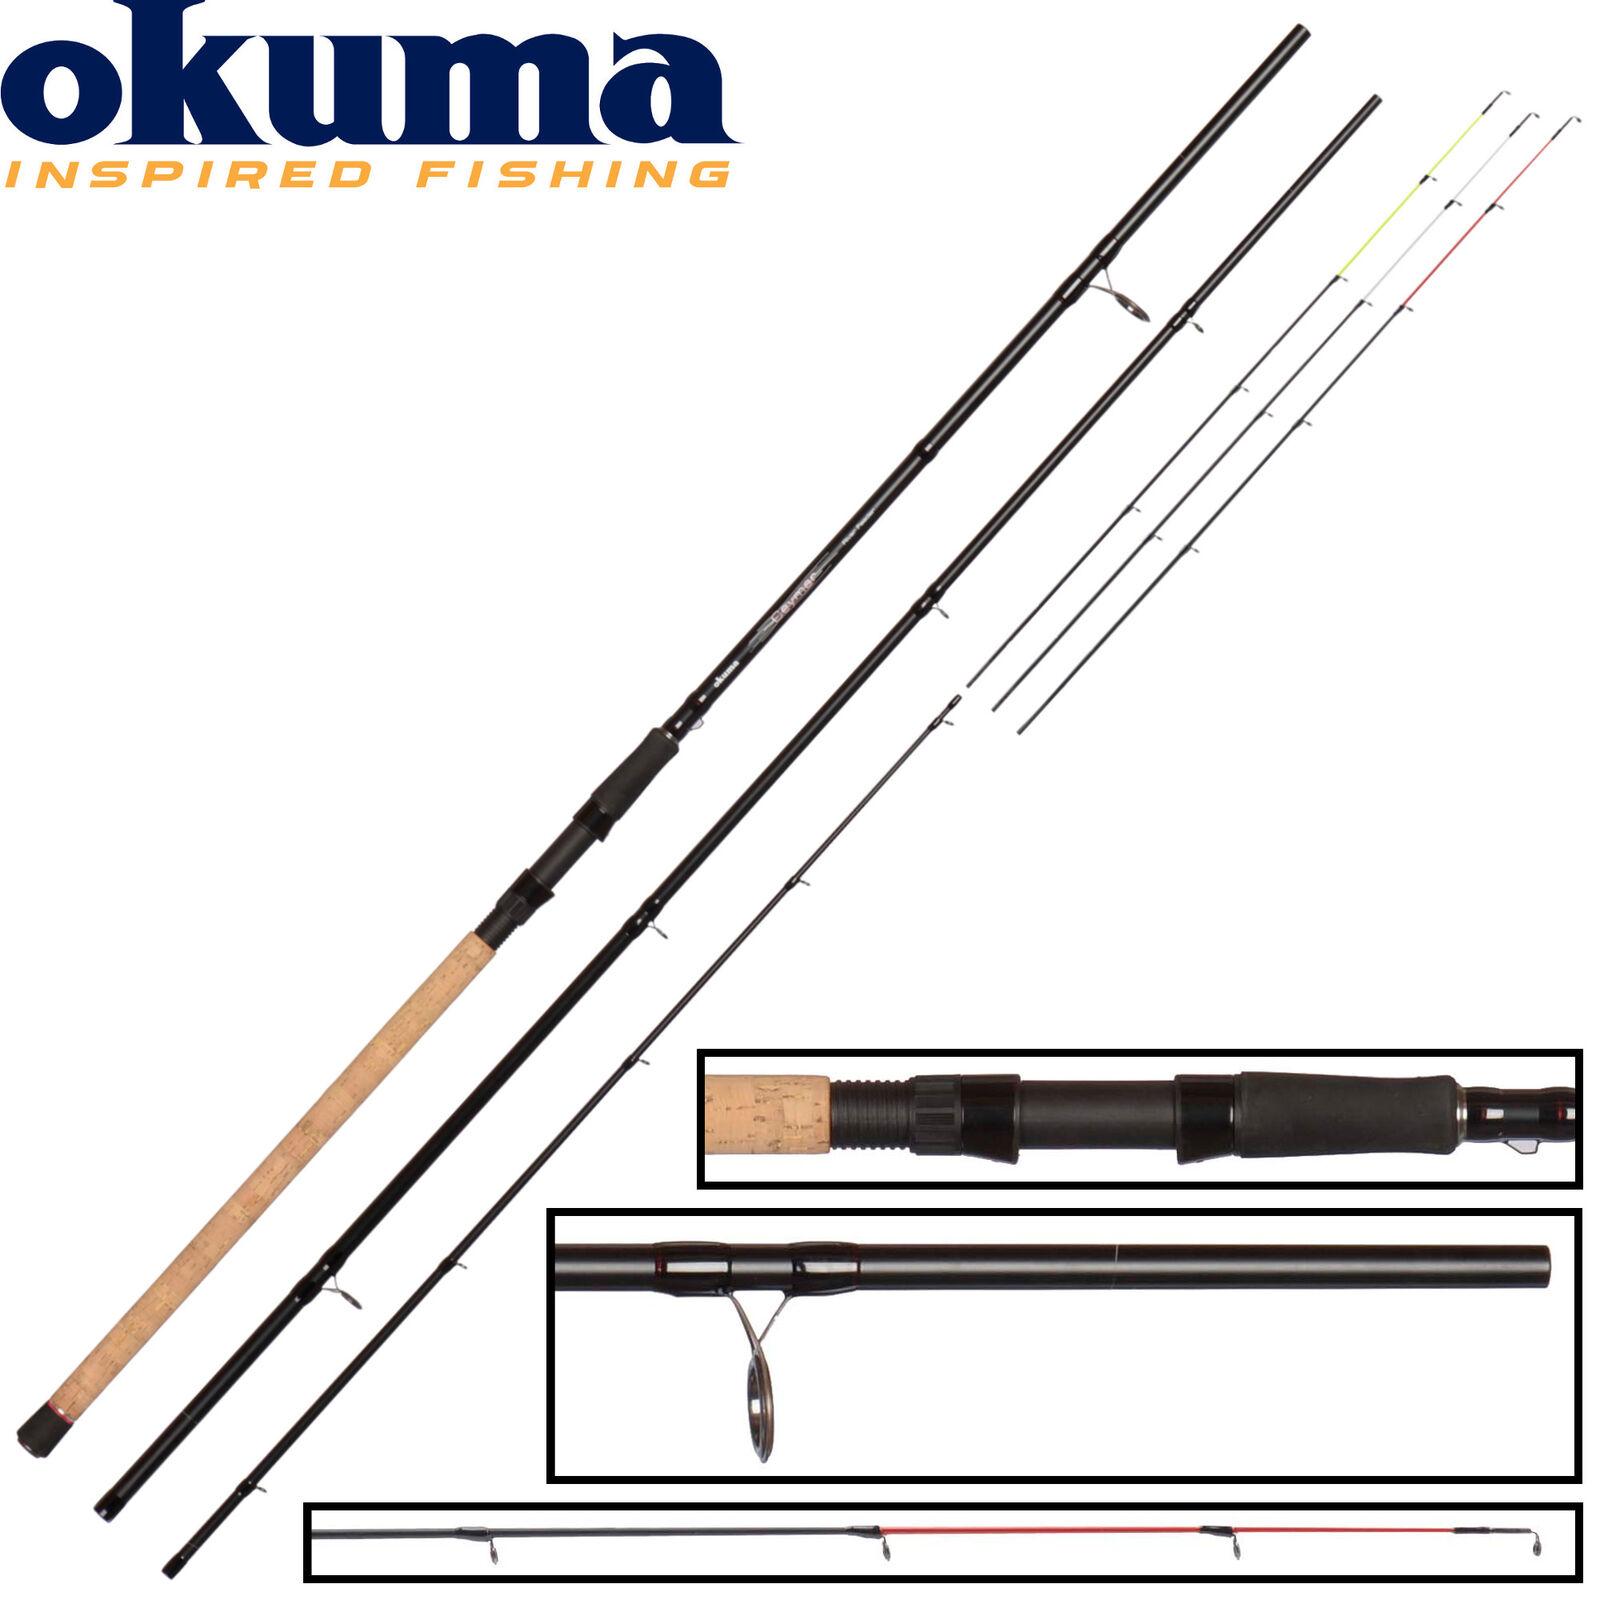 Okuma Ceymar Method Feeder 3,30m 60g - Feederrute, Friedfischrute, Grundrute